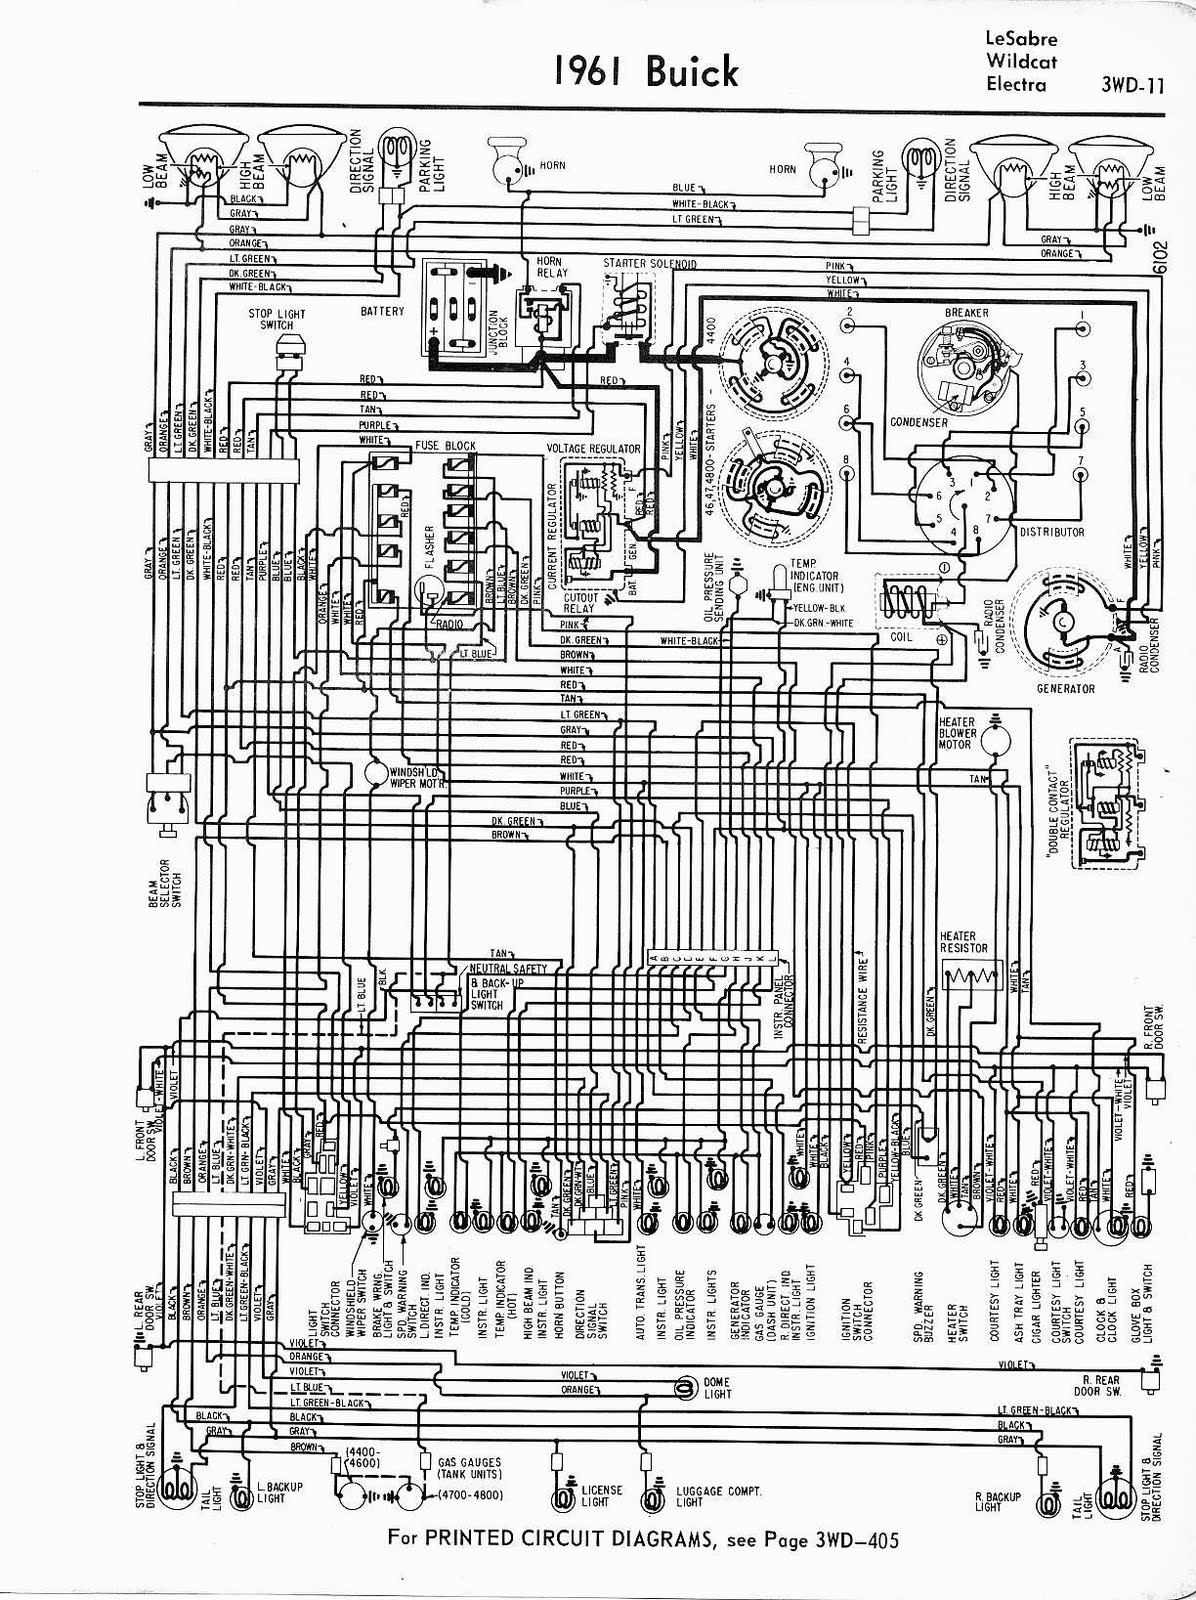 small resolution of 1964 buick skylark fuse box diagram wiring library1964 buick skylark fuse box diagram